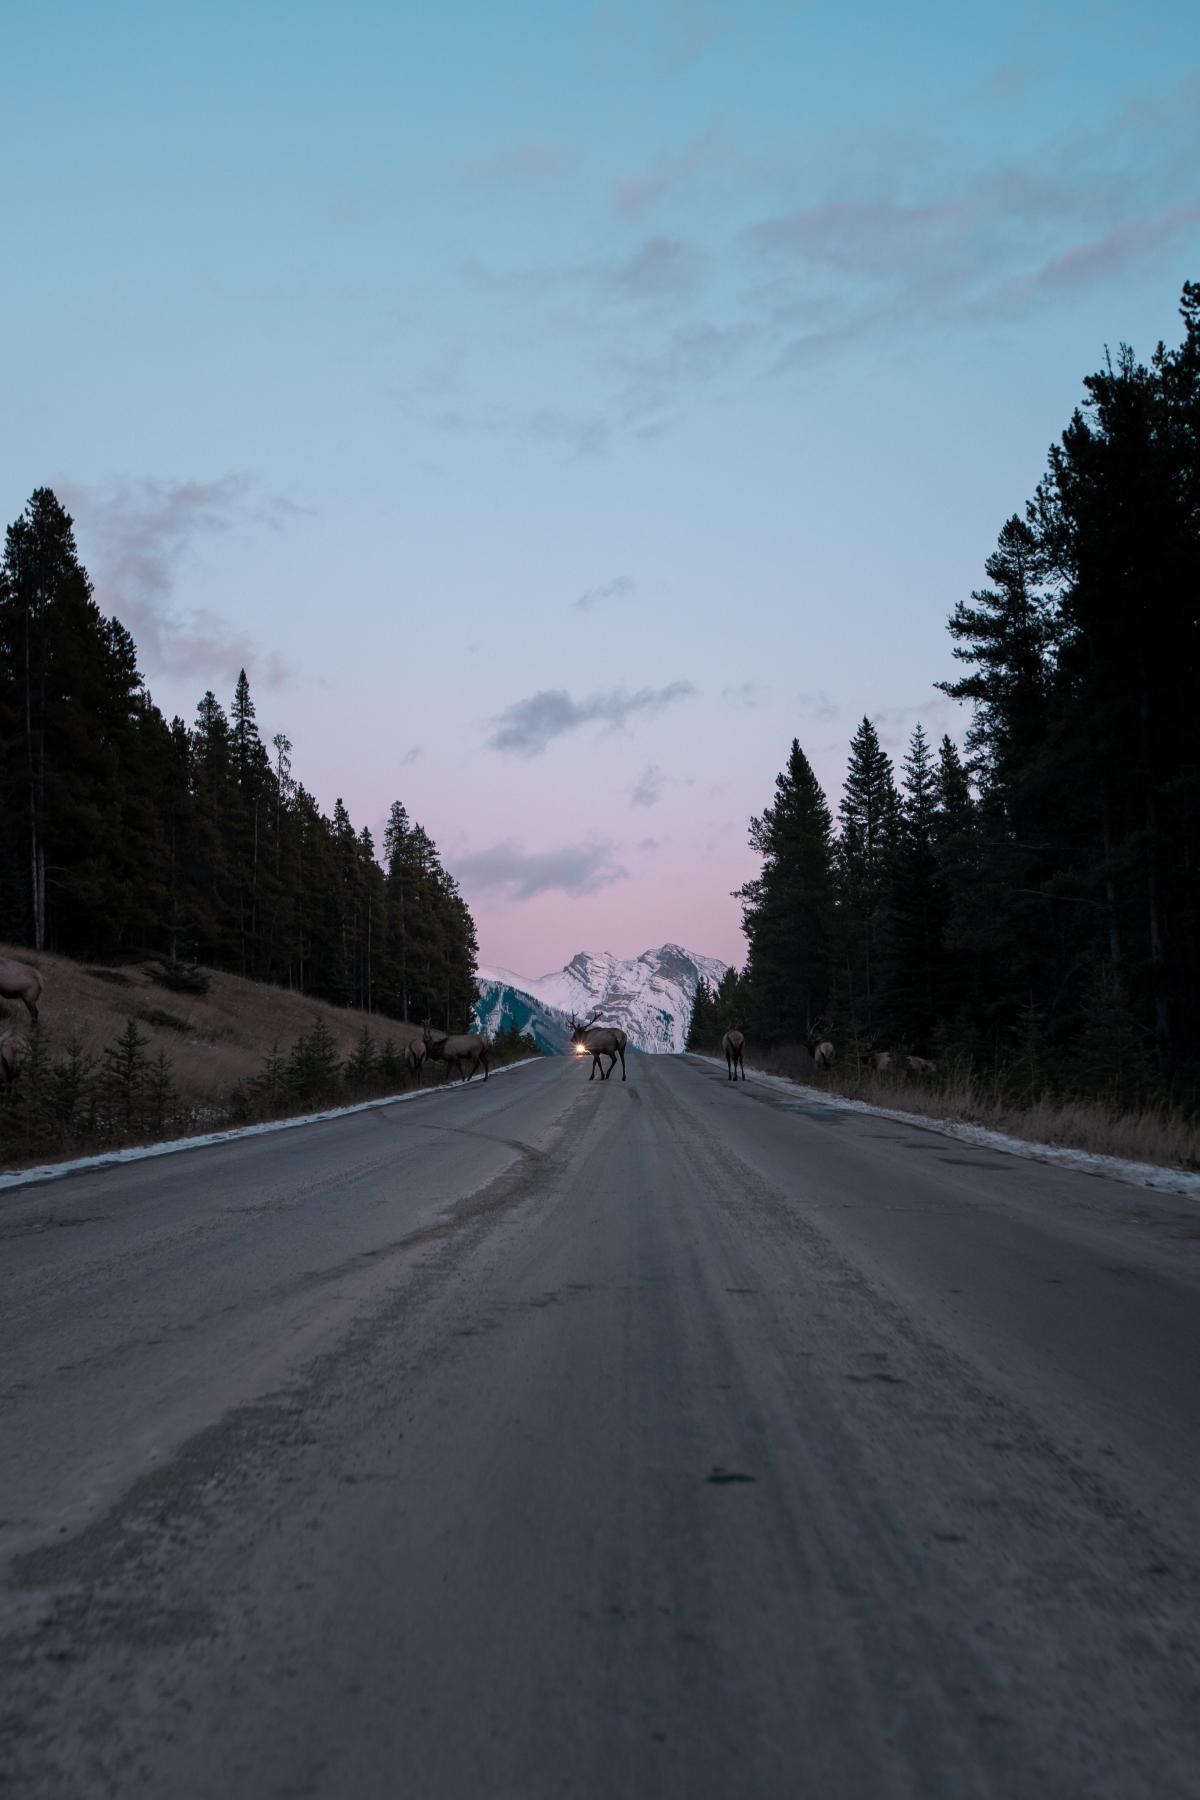 Expressway Road Highway #425549